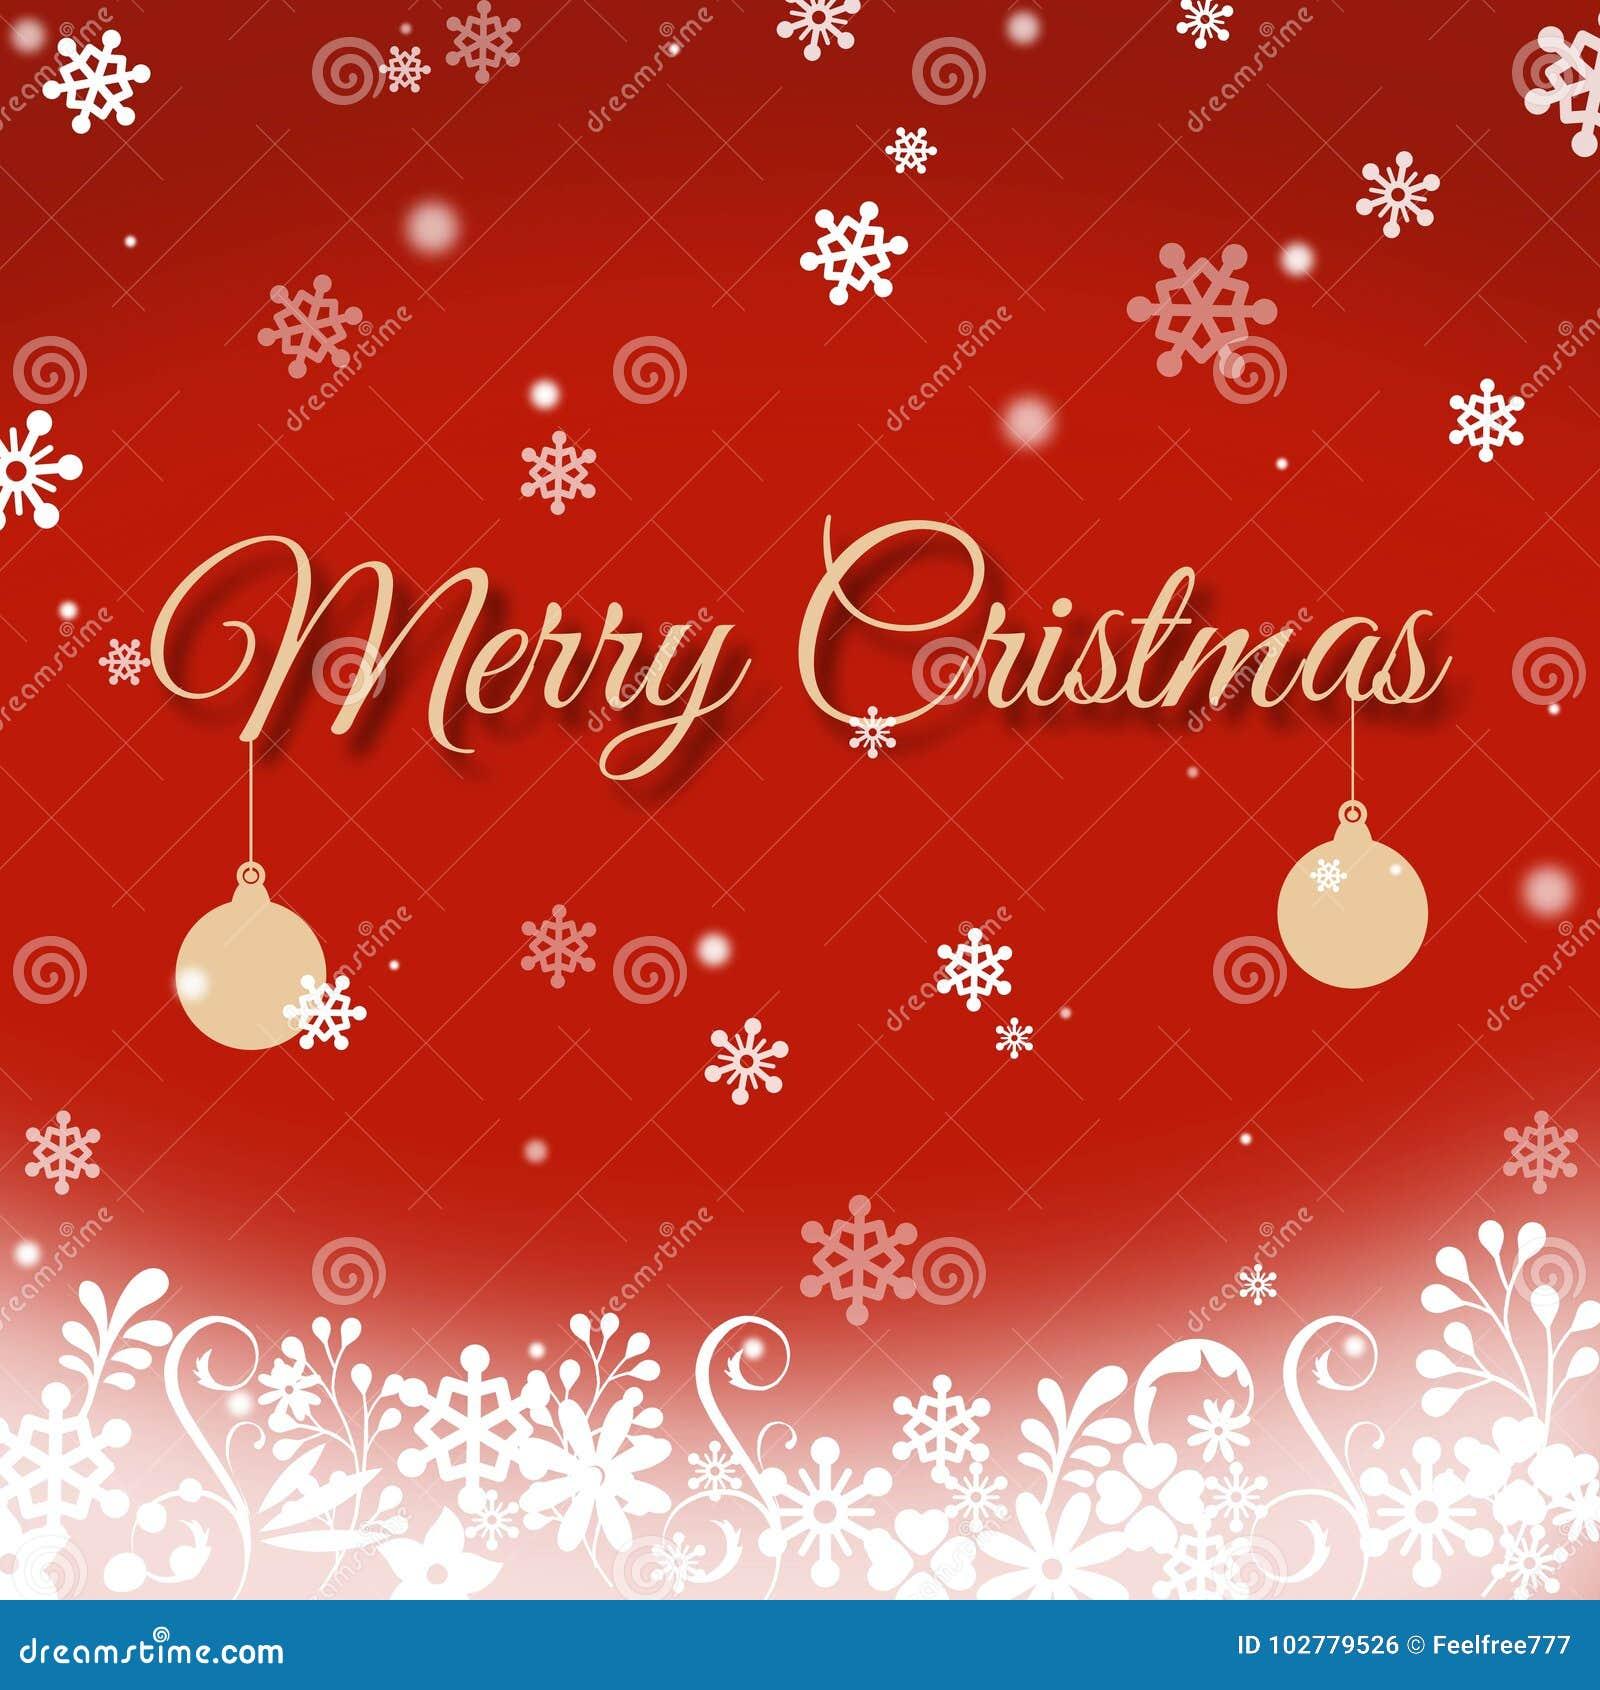 Merry christmas greeting card stock photo image of great download merry christmas greeting card stock photo image of great conversation 102779526 m4hsunfo